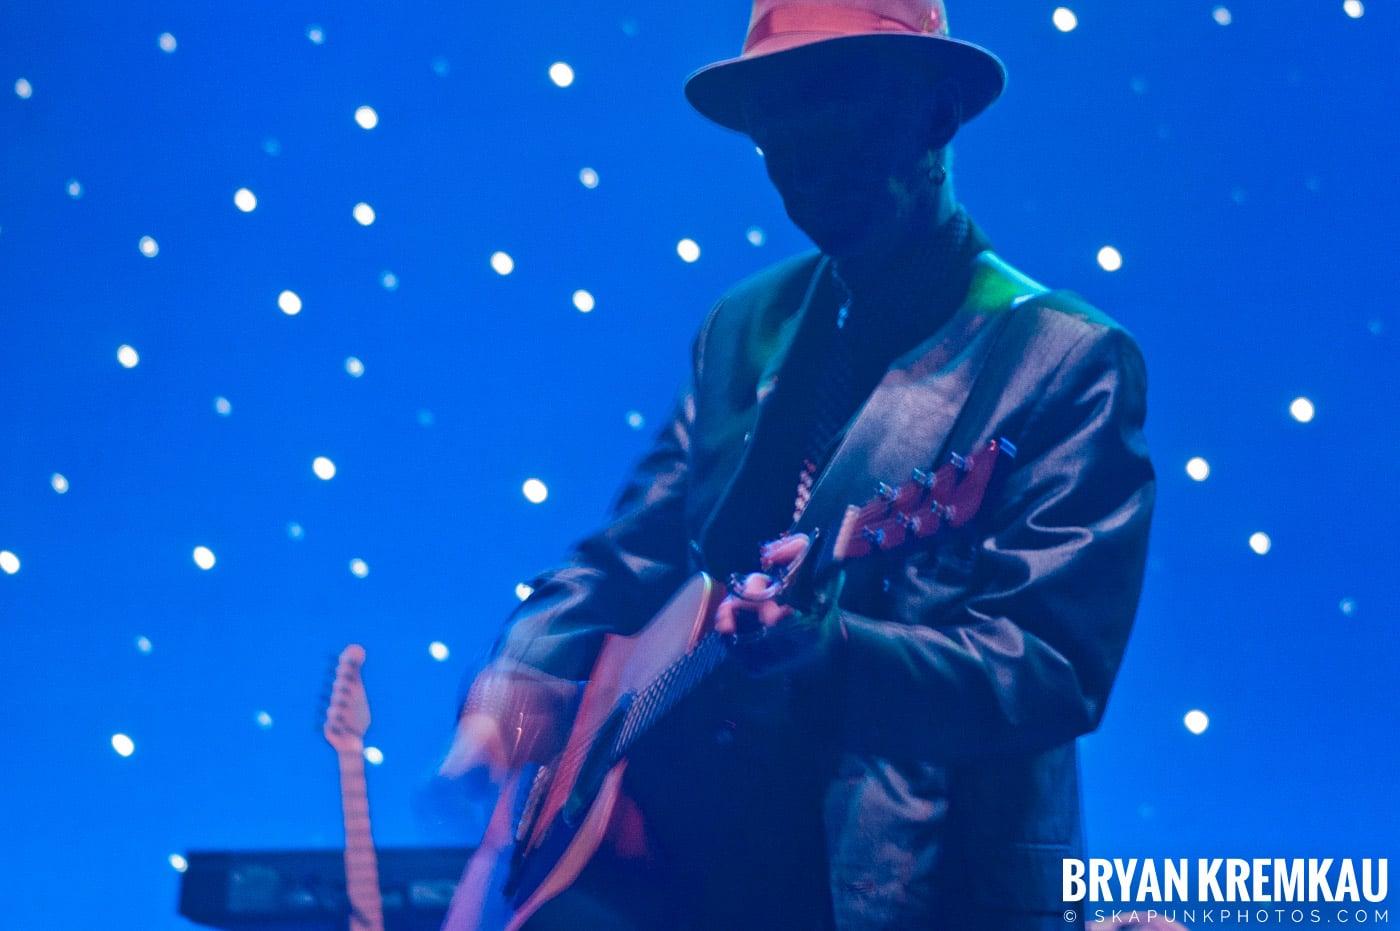 The Pogues @ Brixton Academy, London UK - 12.17.06 (10)